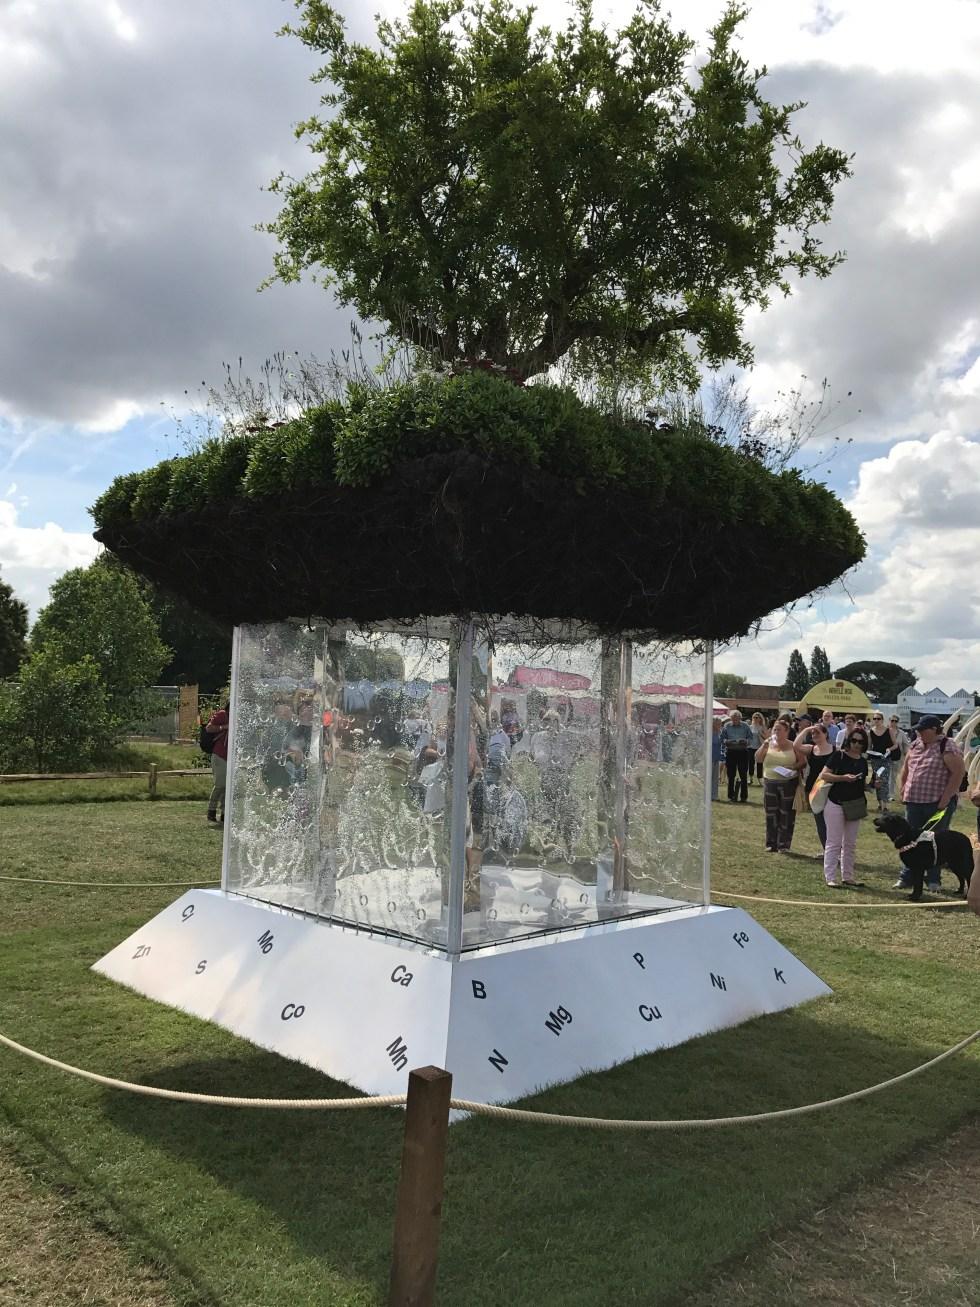 img 0031 Hampton court flower show, a brief summary